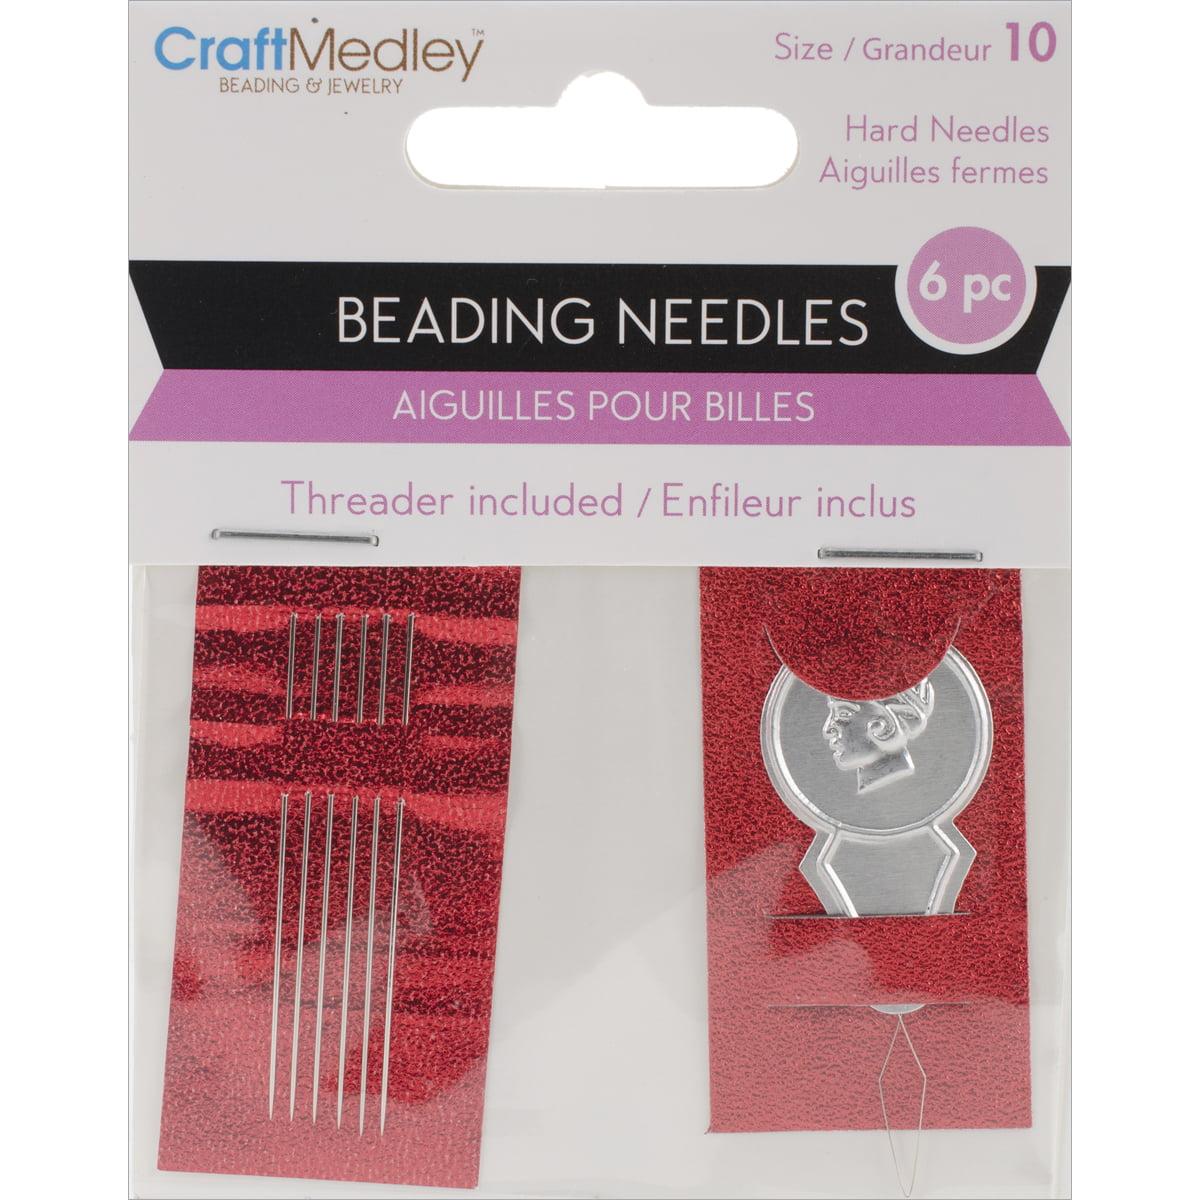 #10 Beading Needles, 6/Pkg with Threader